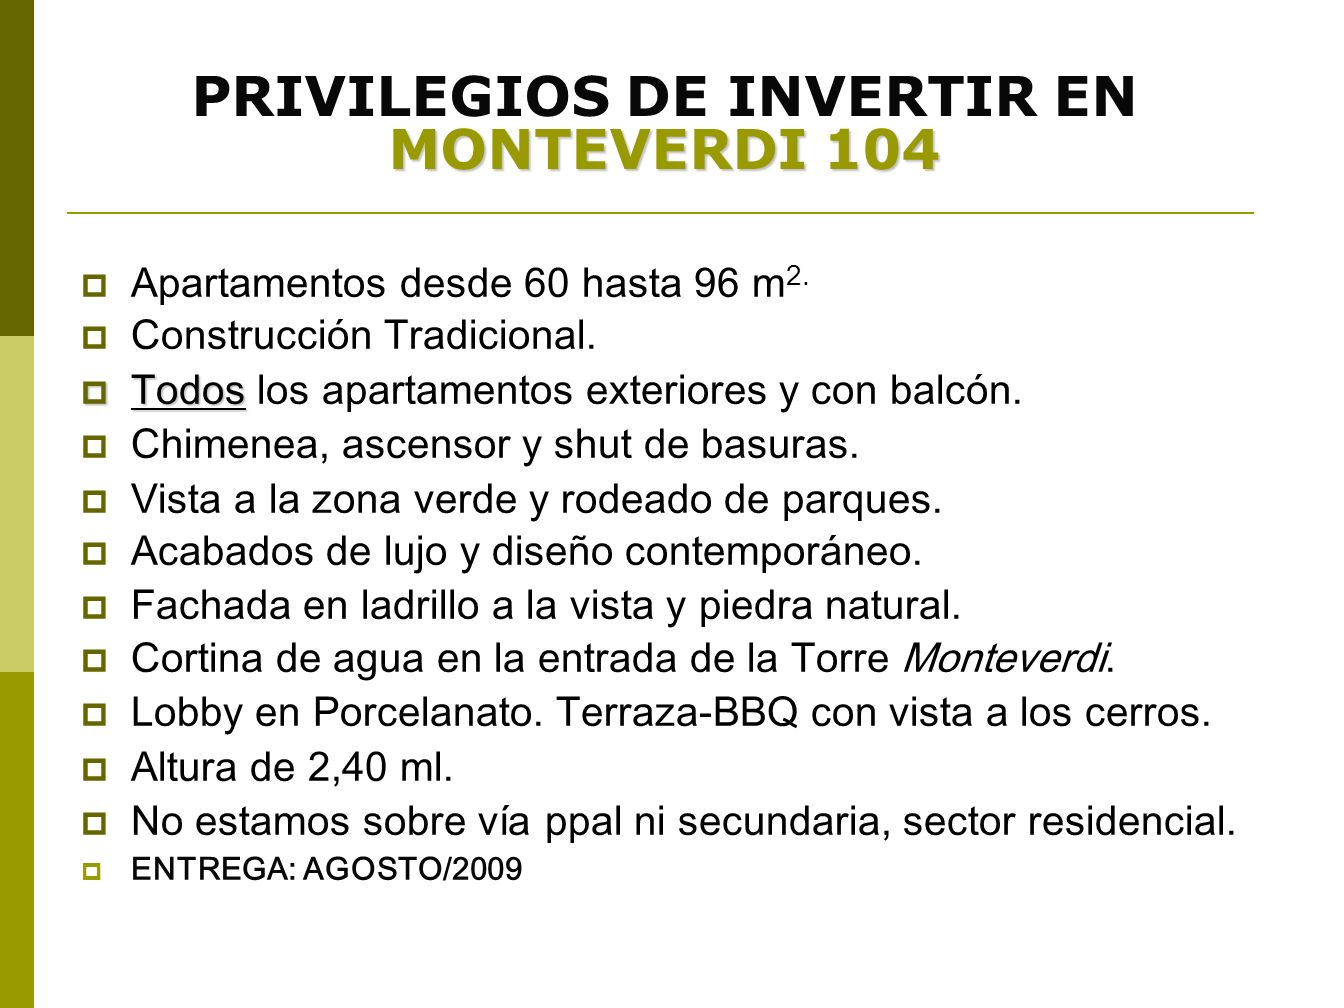 PRIVILEGIOS DE INVERTIR EN MONTEVERDI 104